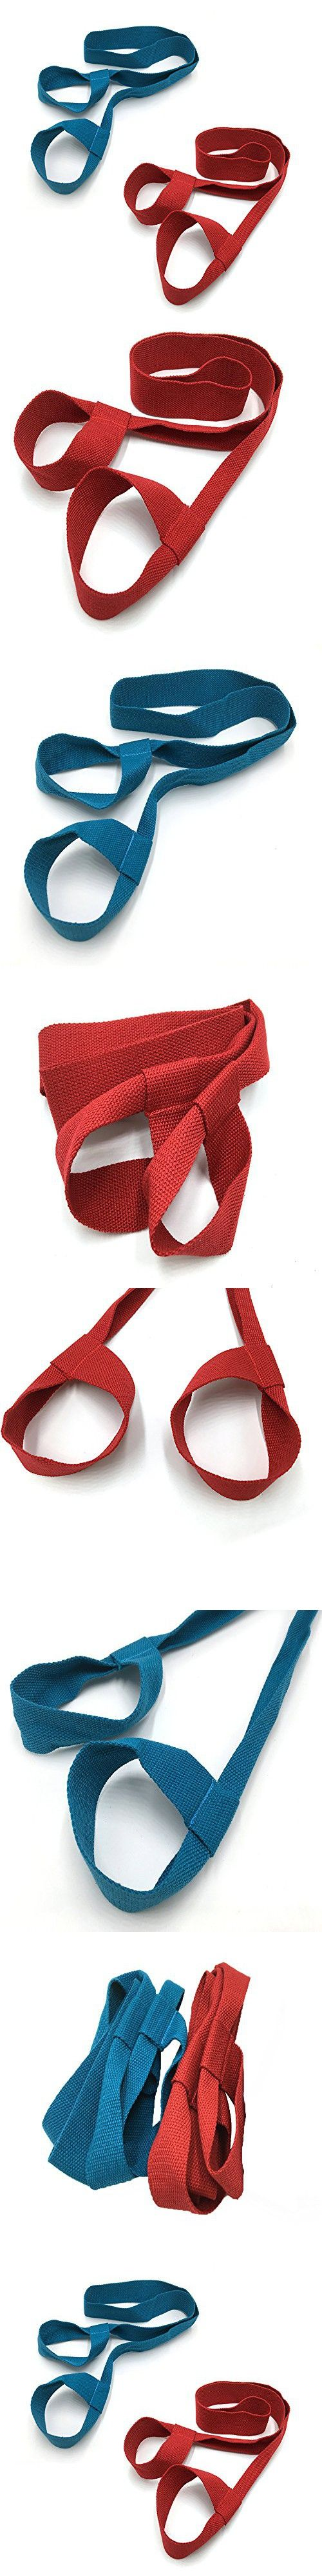 "2 Packs Yoga Mat Sling-Versitile,Stretch&Durable Cotton Mat Straps (Blue&Red, 1.5""x7.0"")"